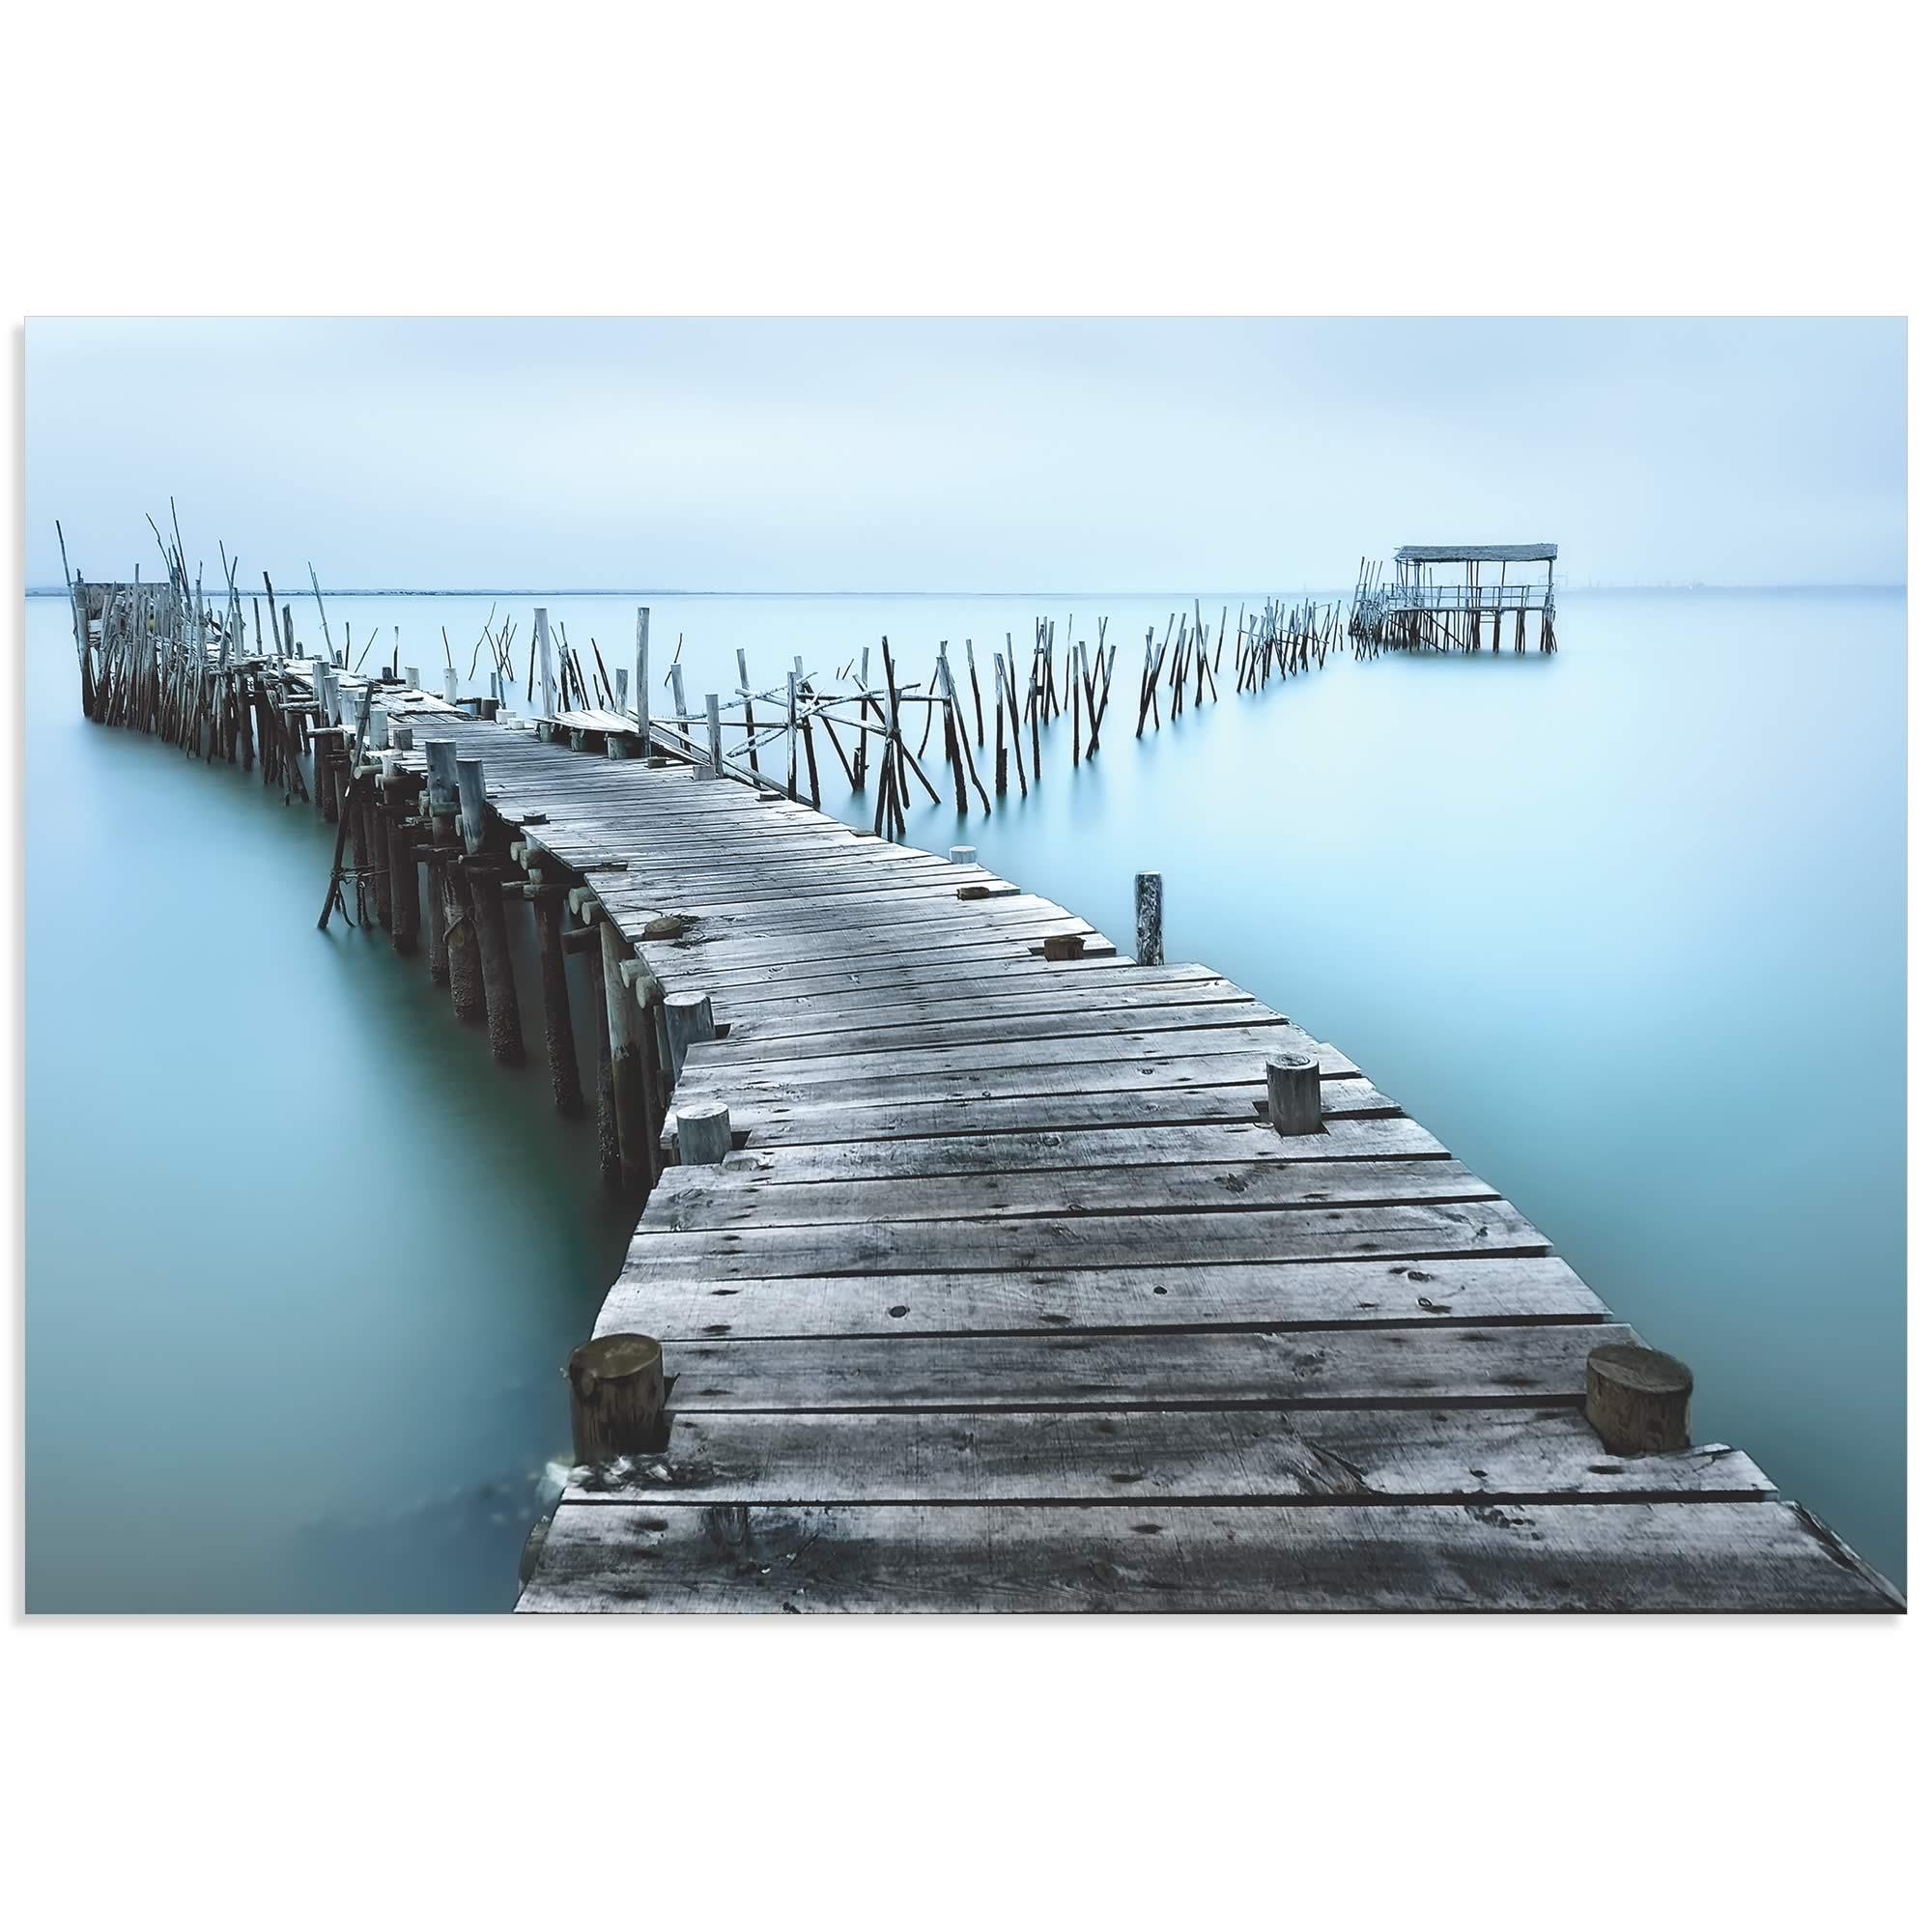 Old Aqua Dock by Jesus M. Garcia - Coastal Art on Metal or Acrylic